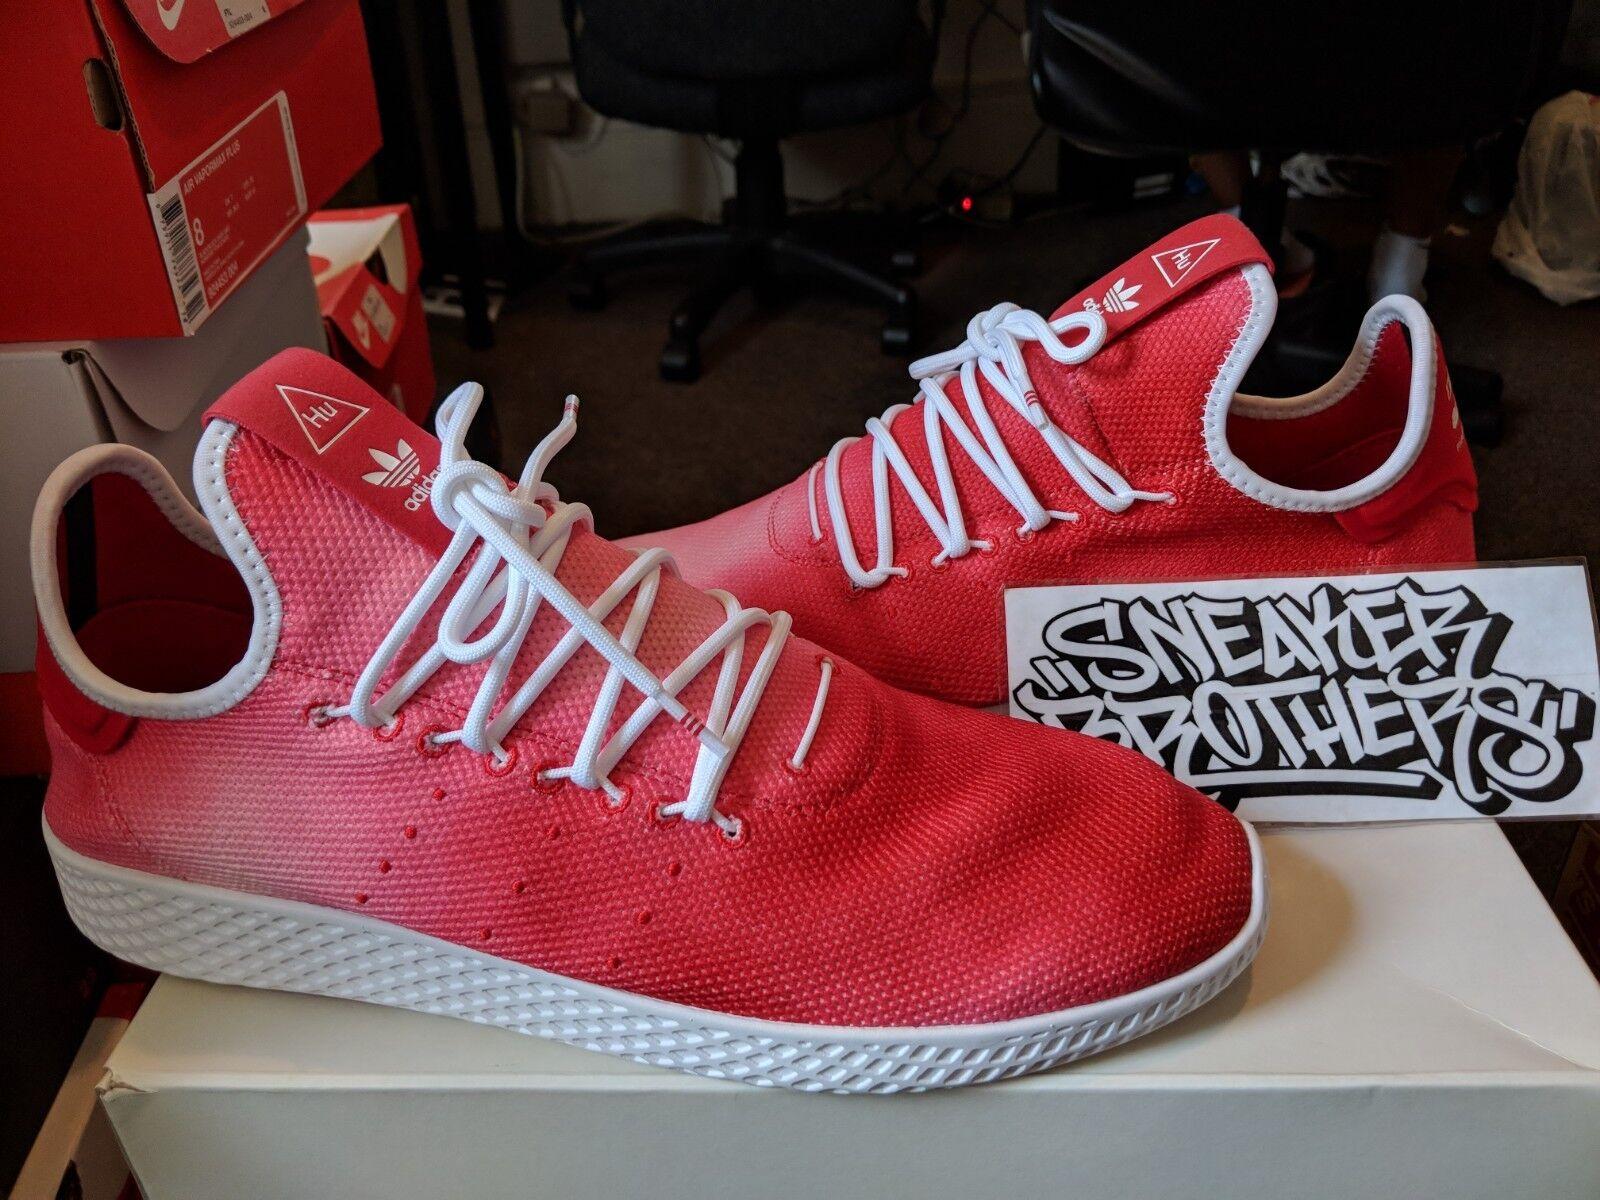 Adidas x Originals PW Tennis Hu Holi Pharrell Williams Scarlet Red White DA9615